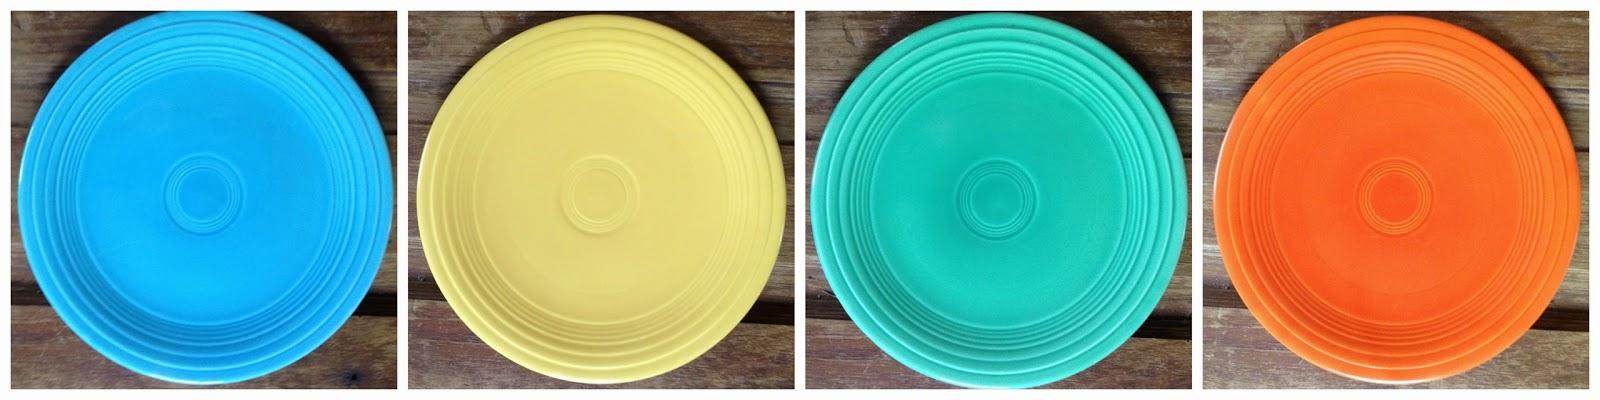 http://stores.ebay.com/Saving-Shepherd/Pottery-Glass-/_i.html?_fsub=8240425013